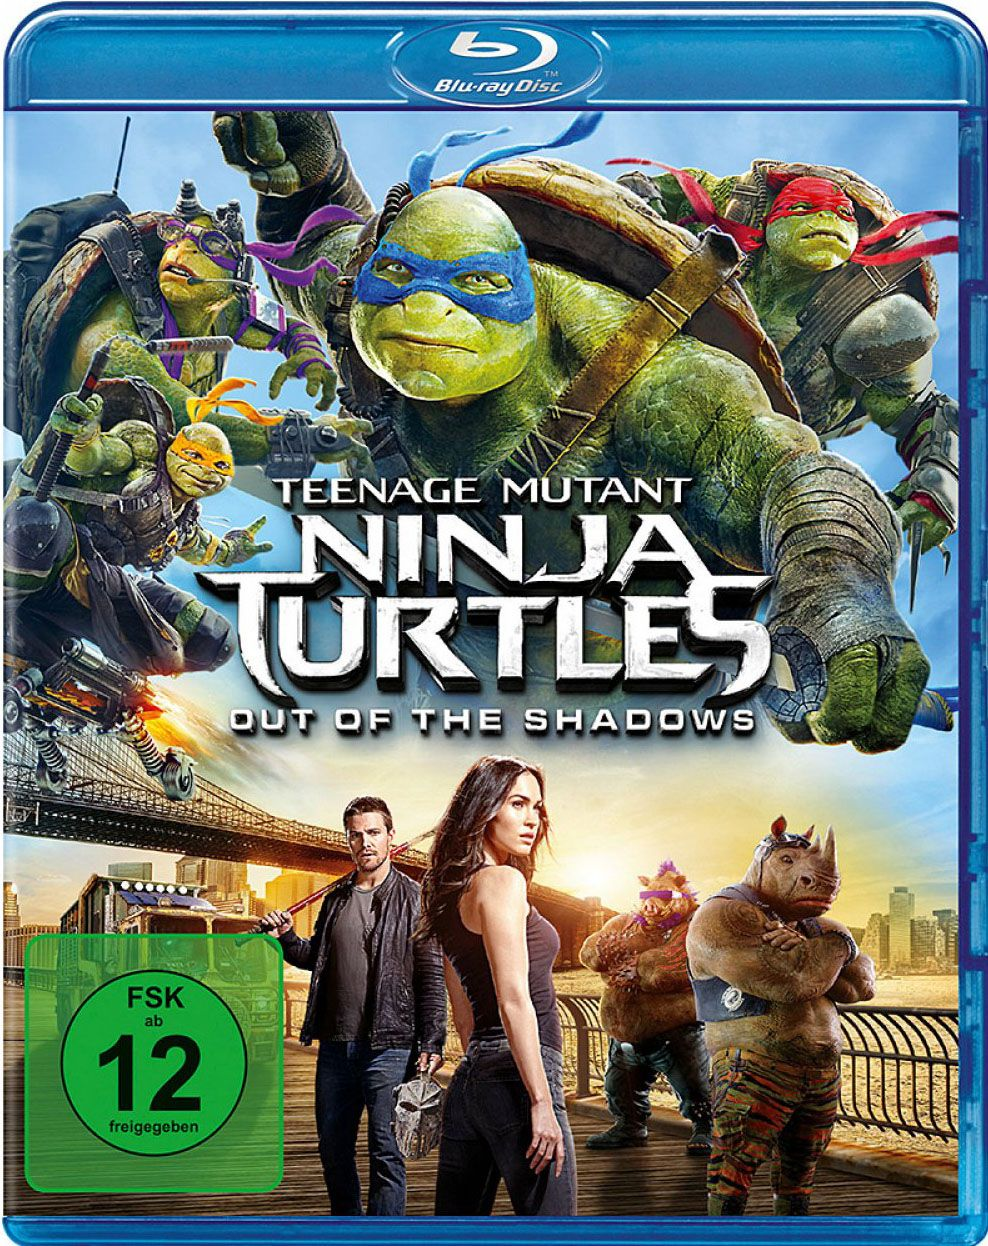 Teenage Mutant Ninja Turtles - Out of the Shadows (BLURAY)